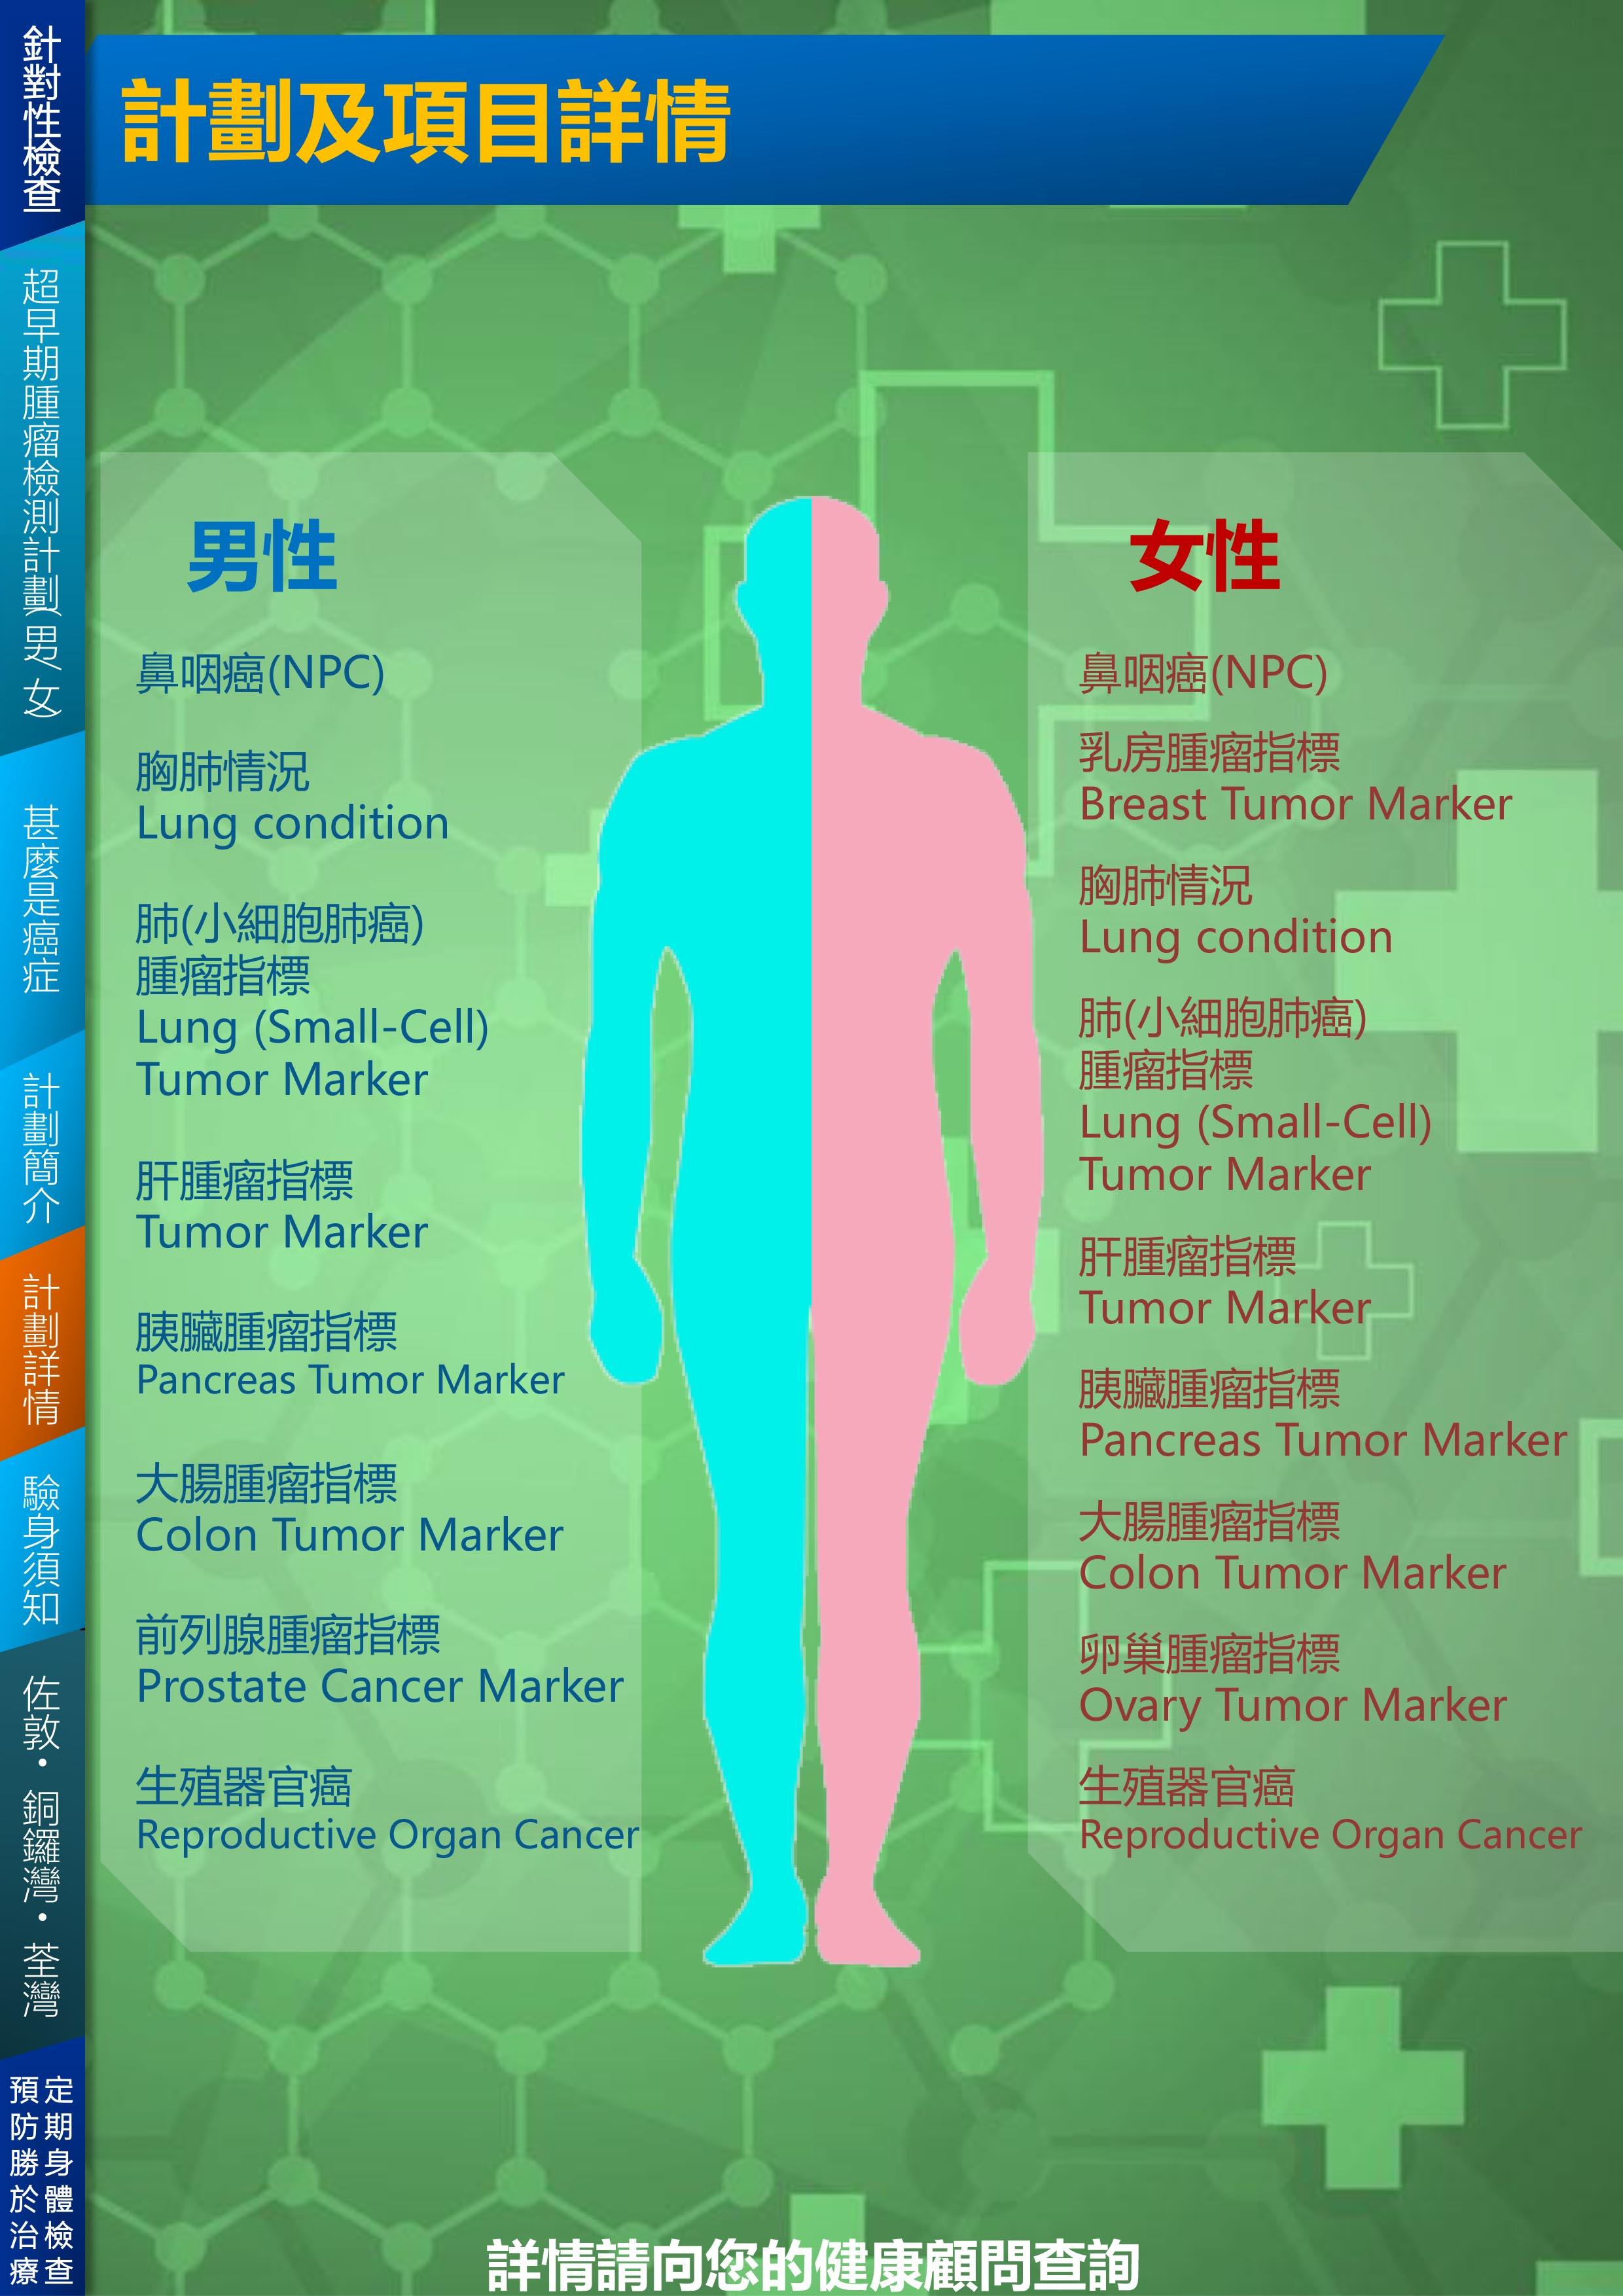 ccm-cancer-marker-4.jpg